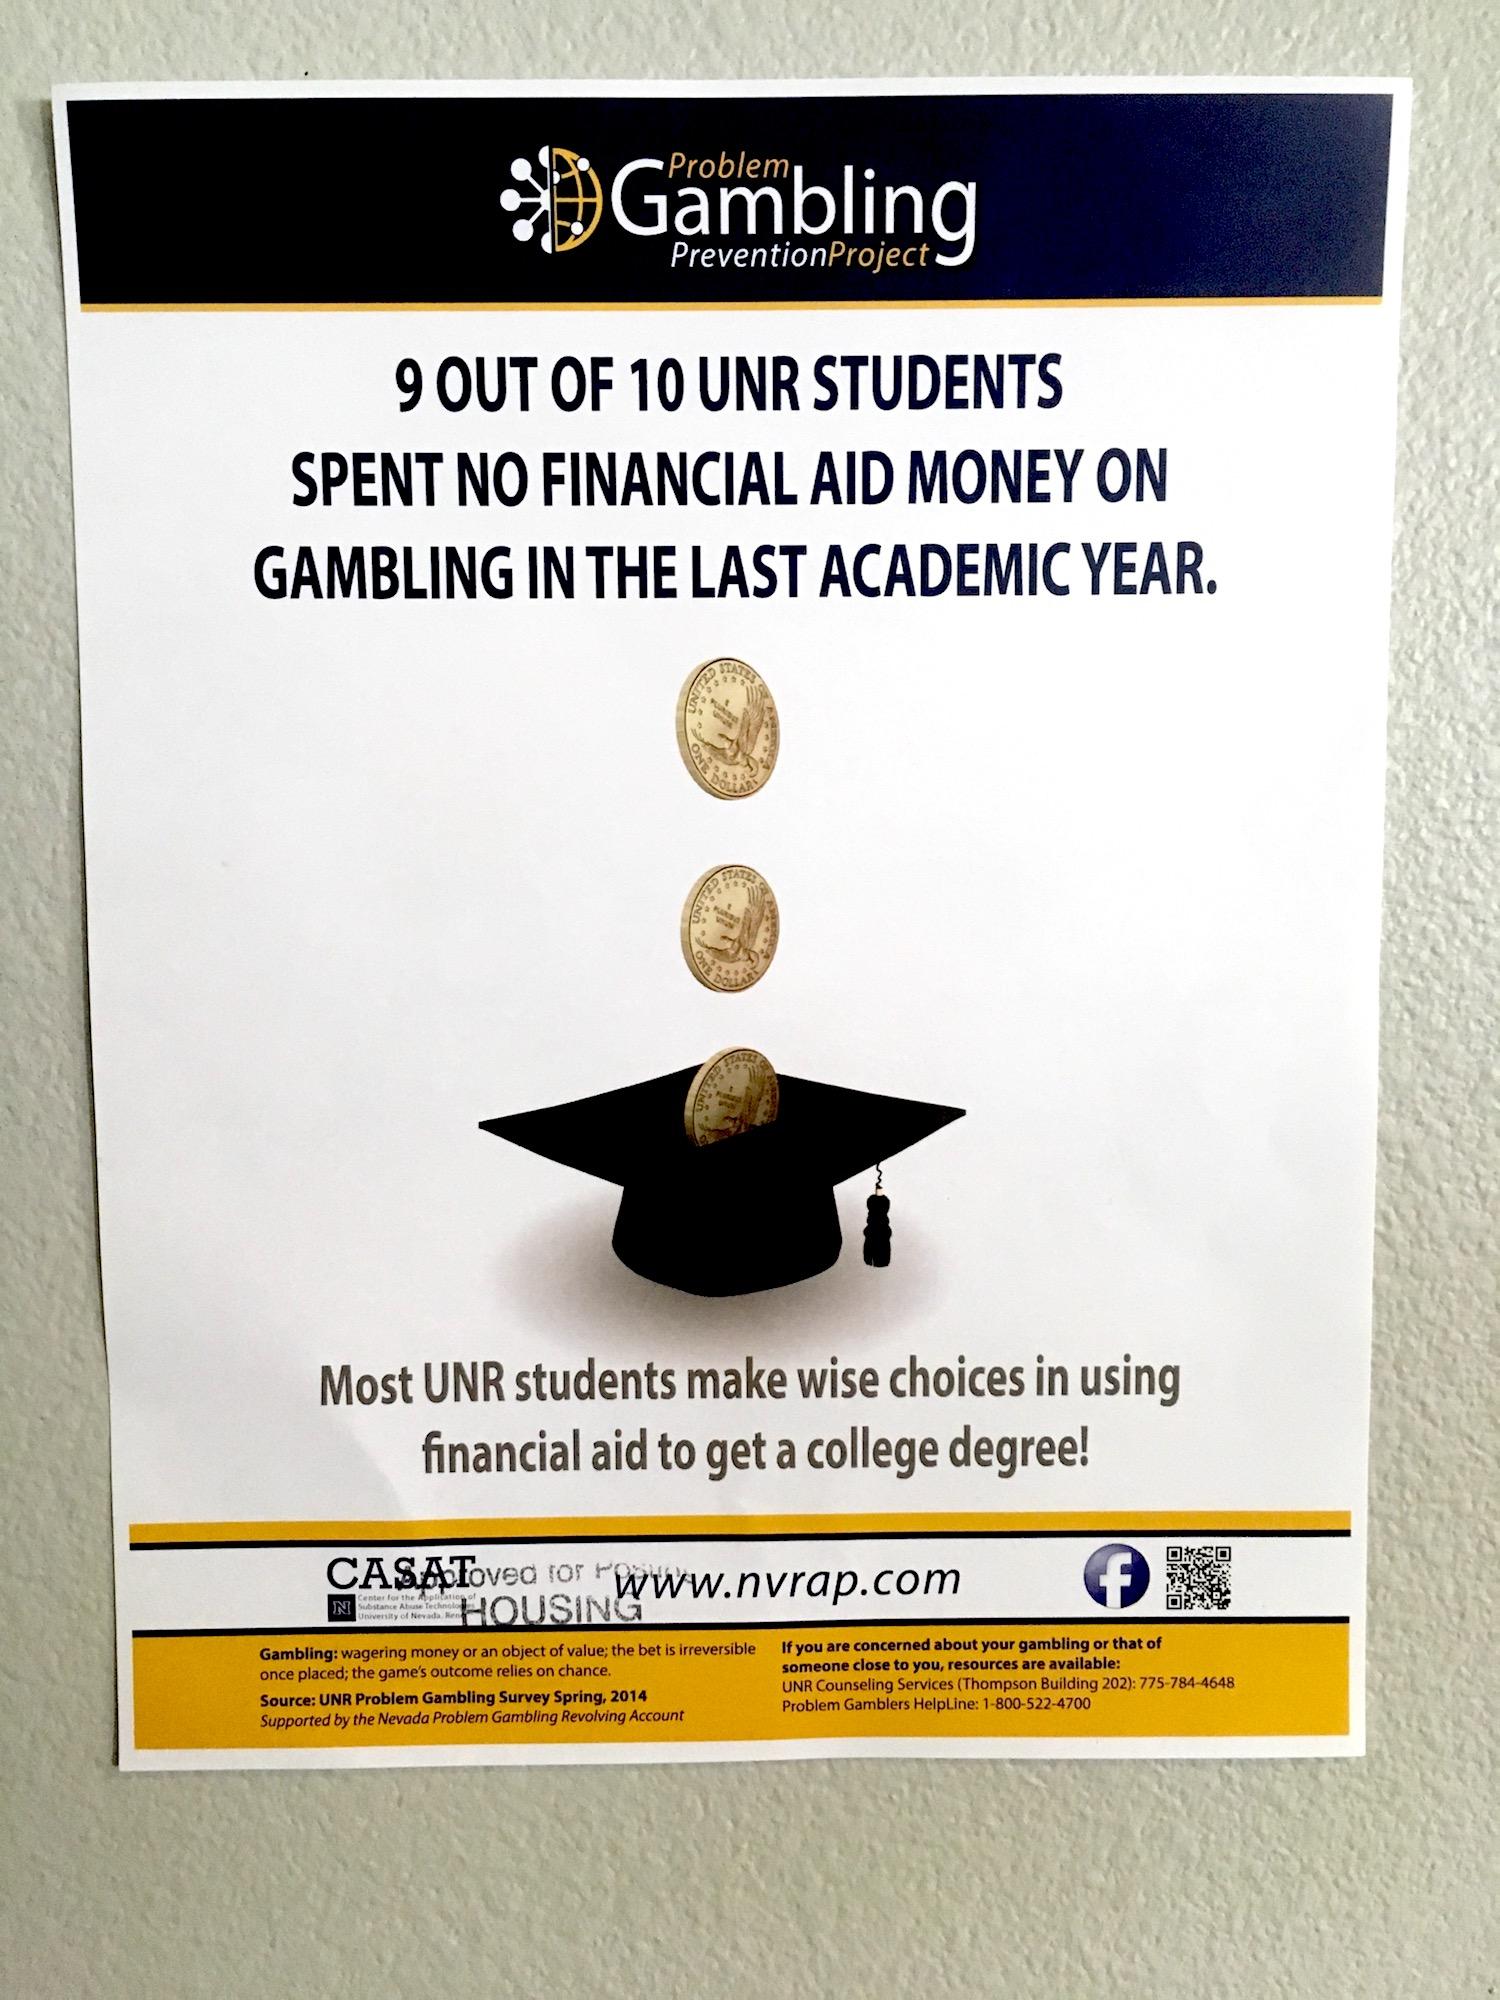 UNR-Student-Gambling.jpg